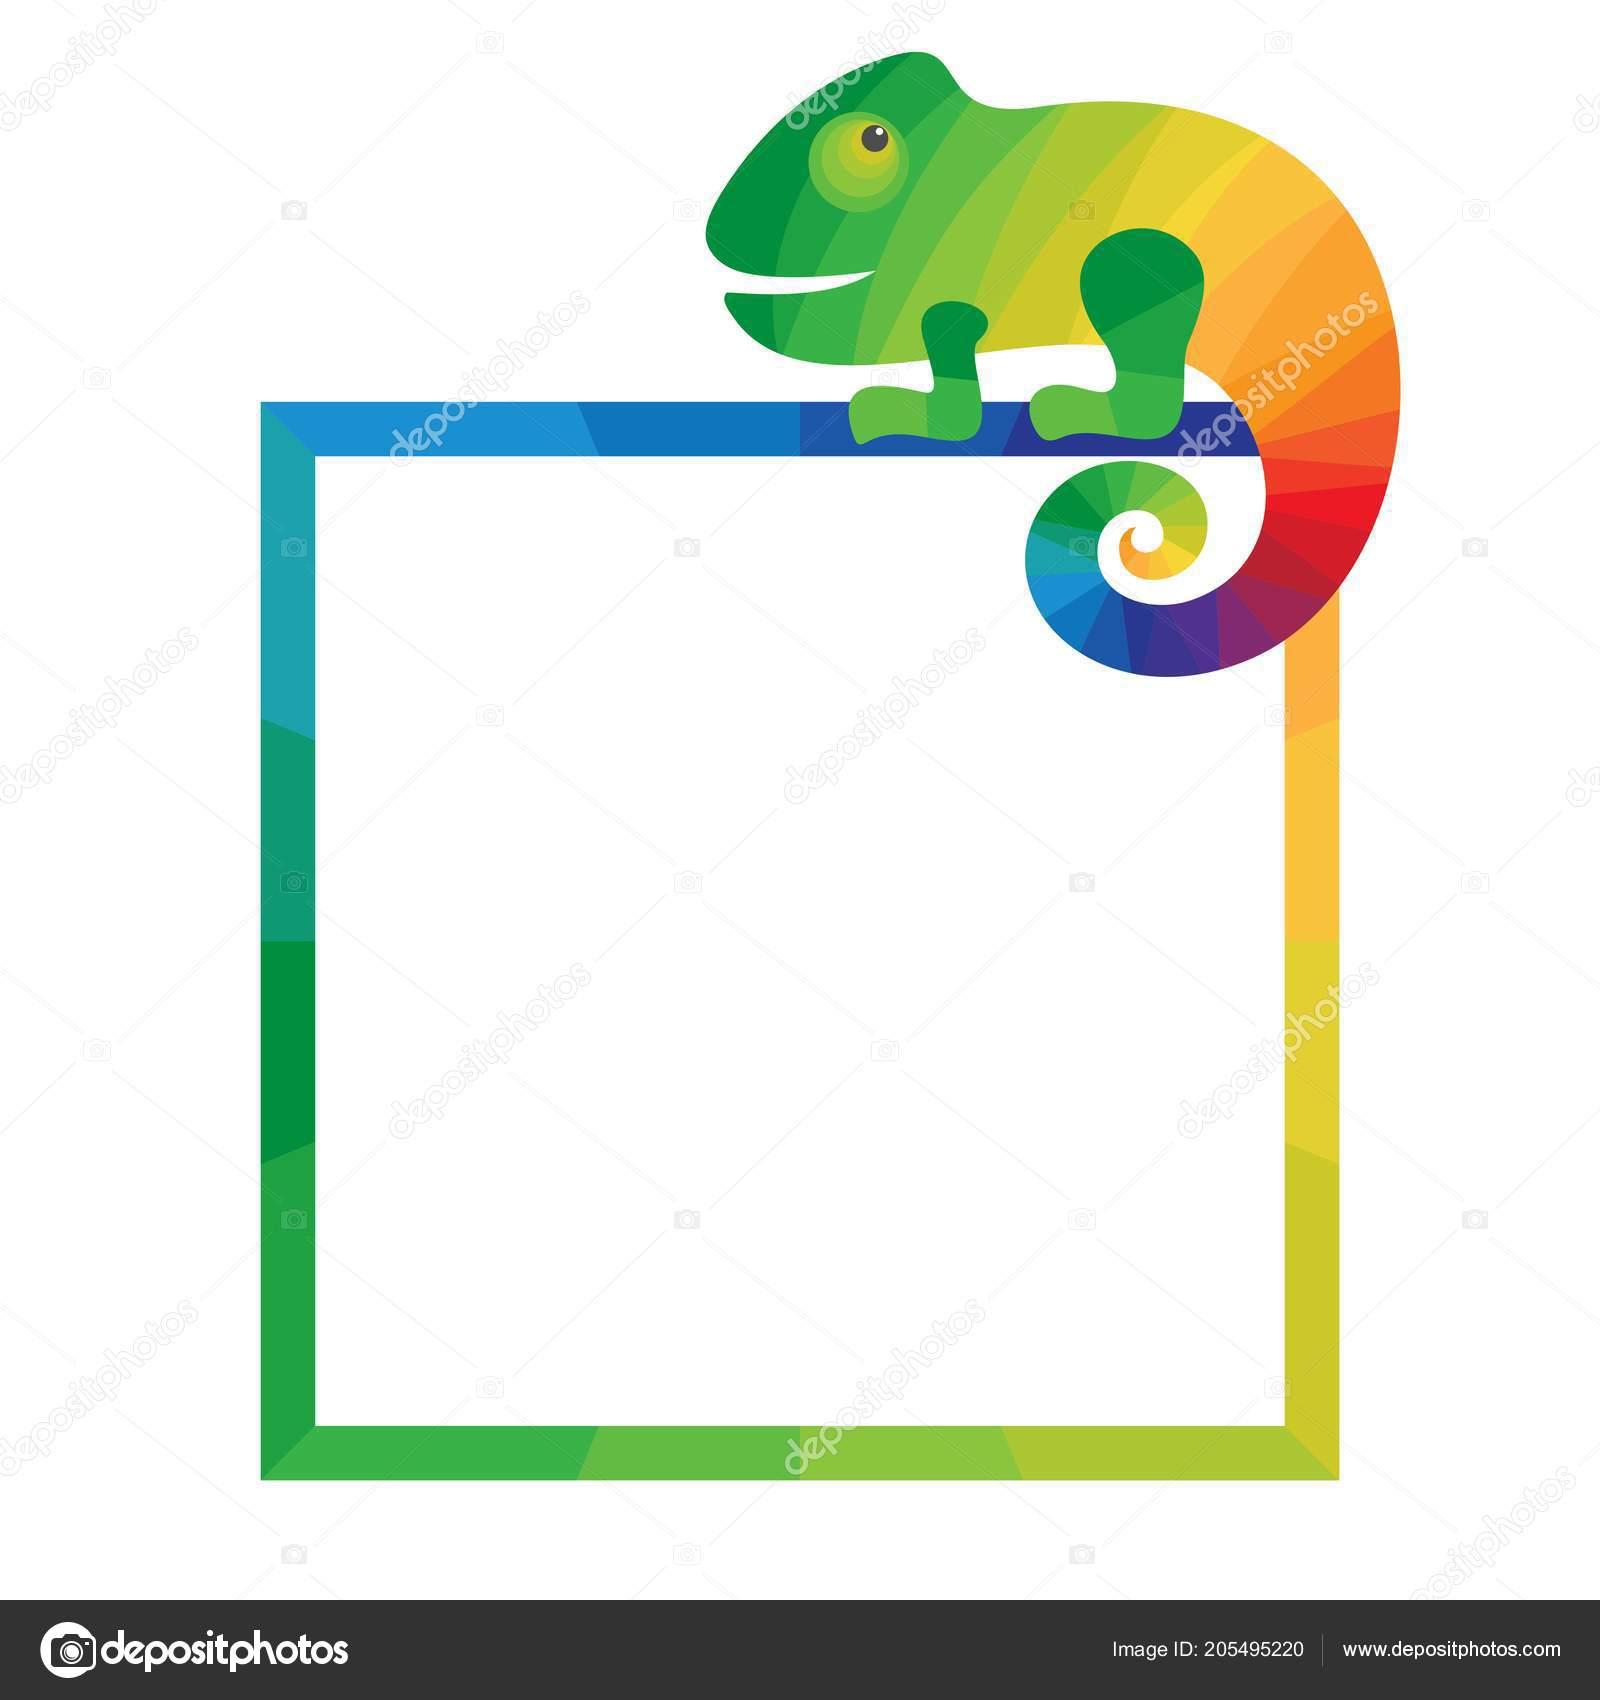 Multicolored Square Frame Chameleon Template Photo Frame Flyer White